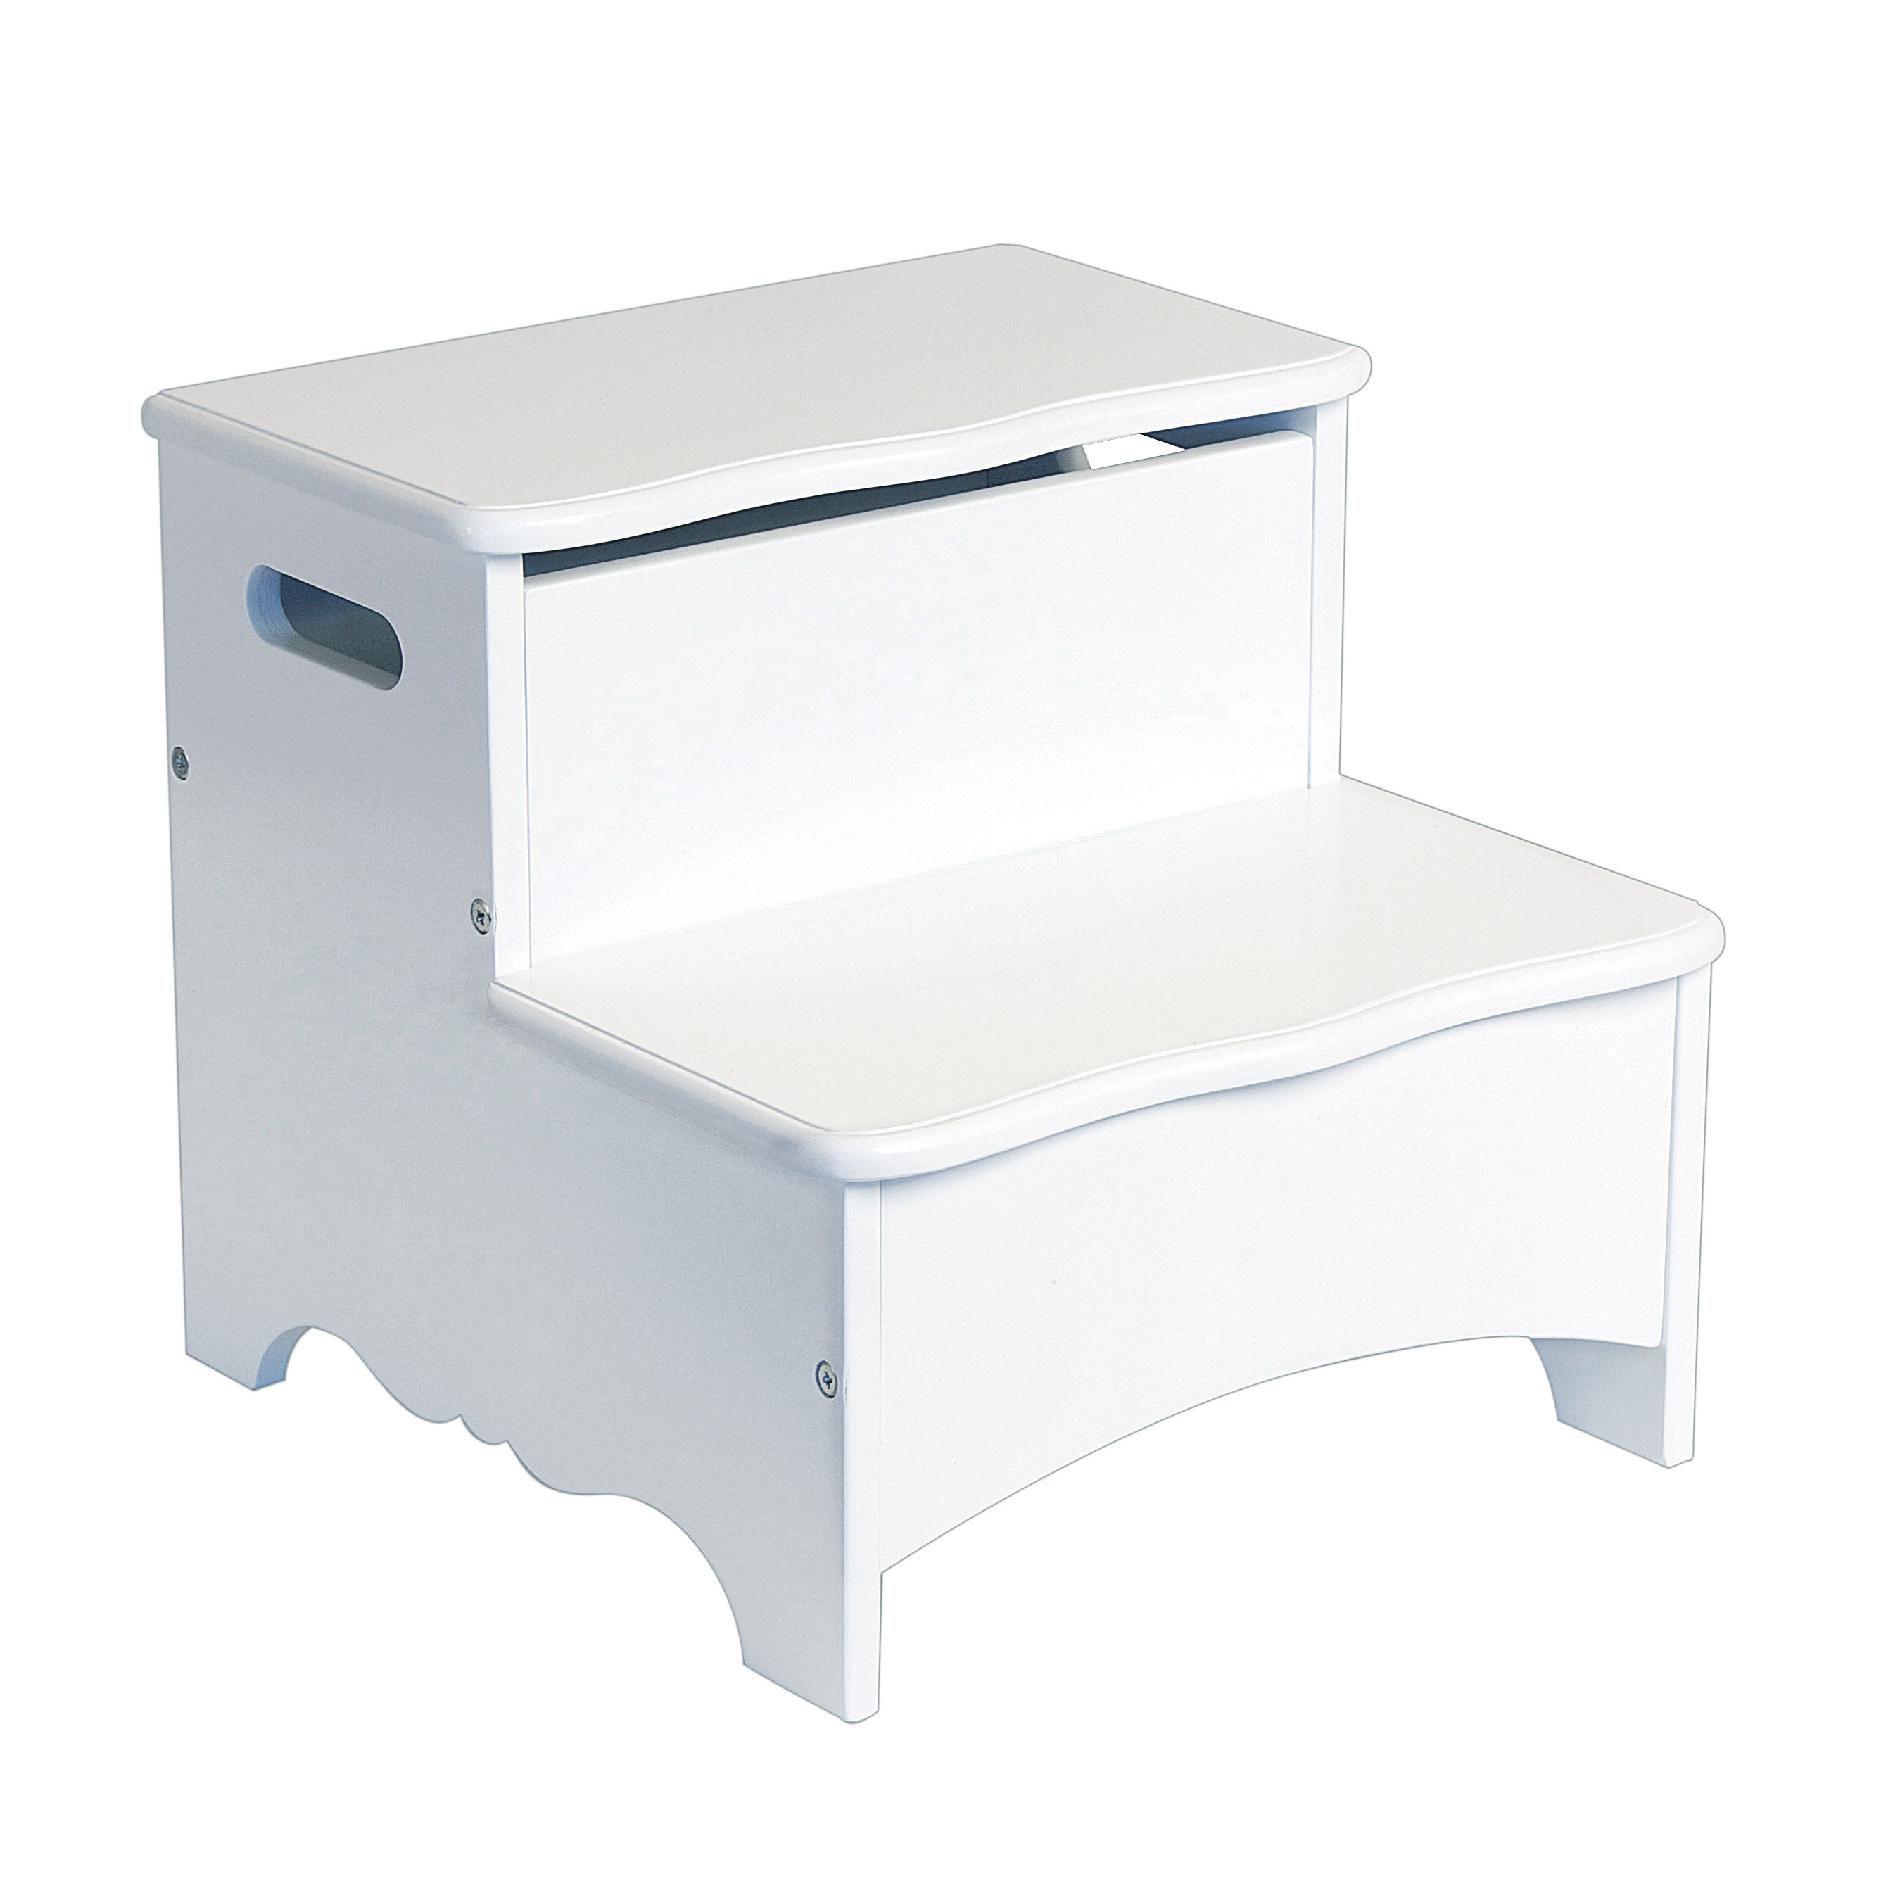 Guidecraft Classic White Storage Step Up PartNumber: 00824329000P KsnValue: 5316530 MfgPartNumber: G85706